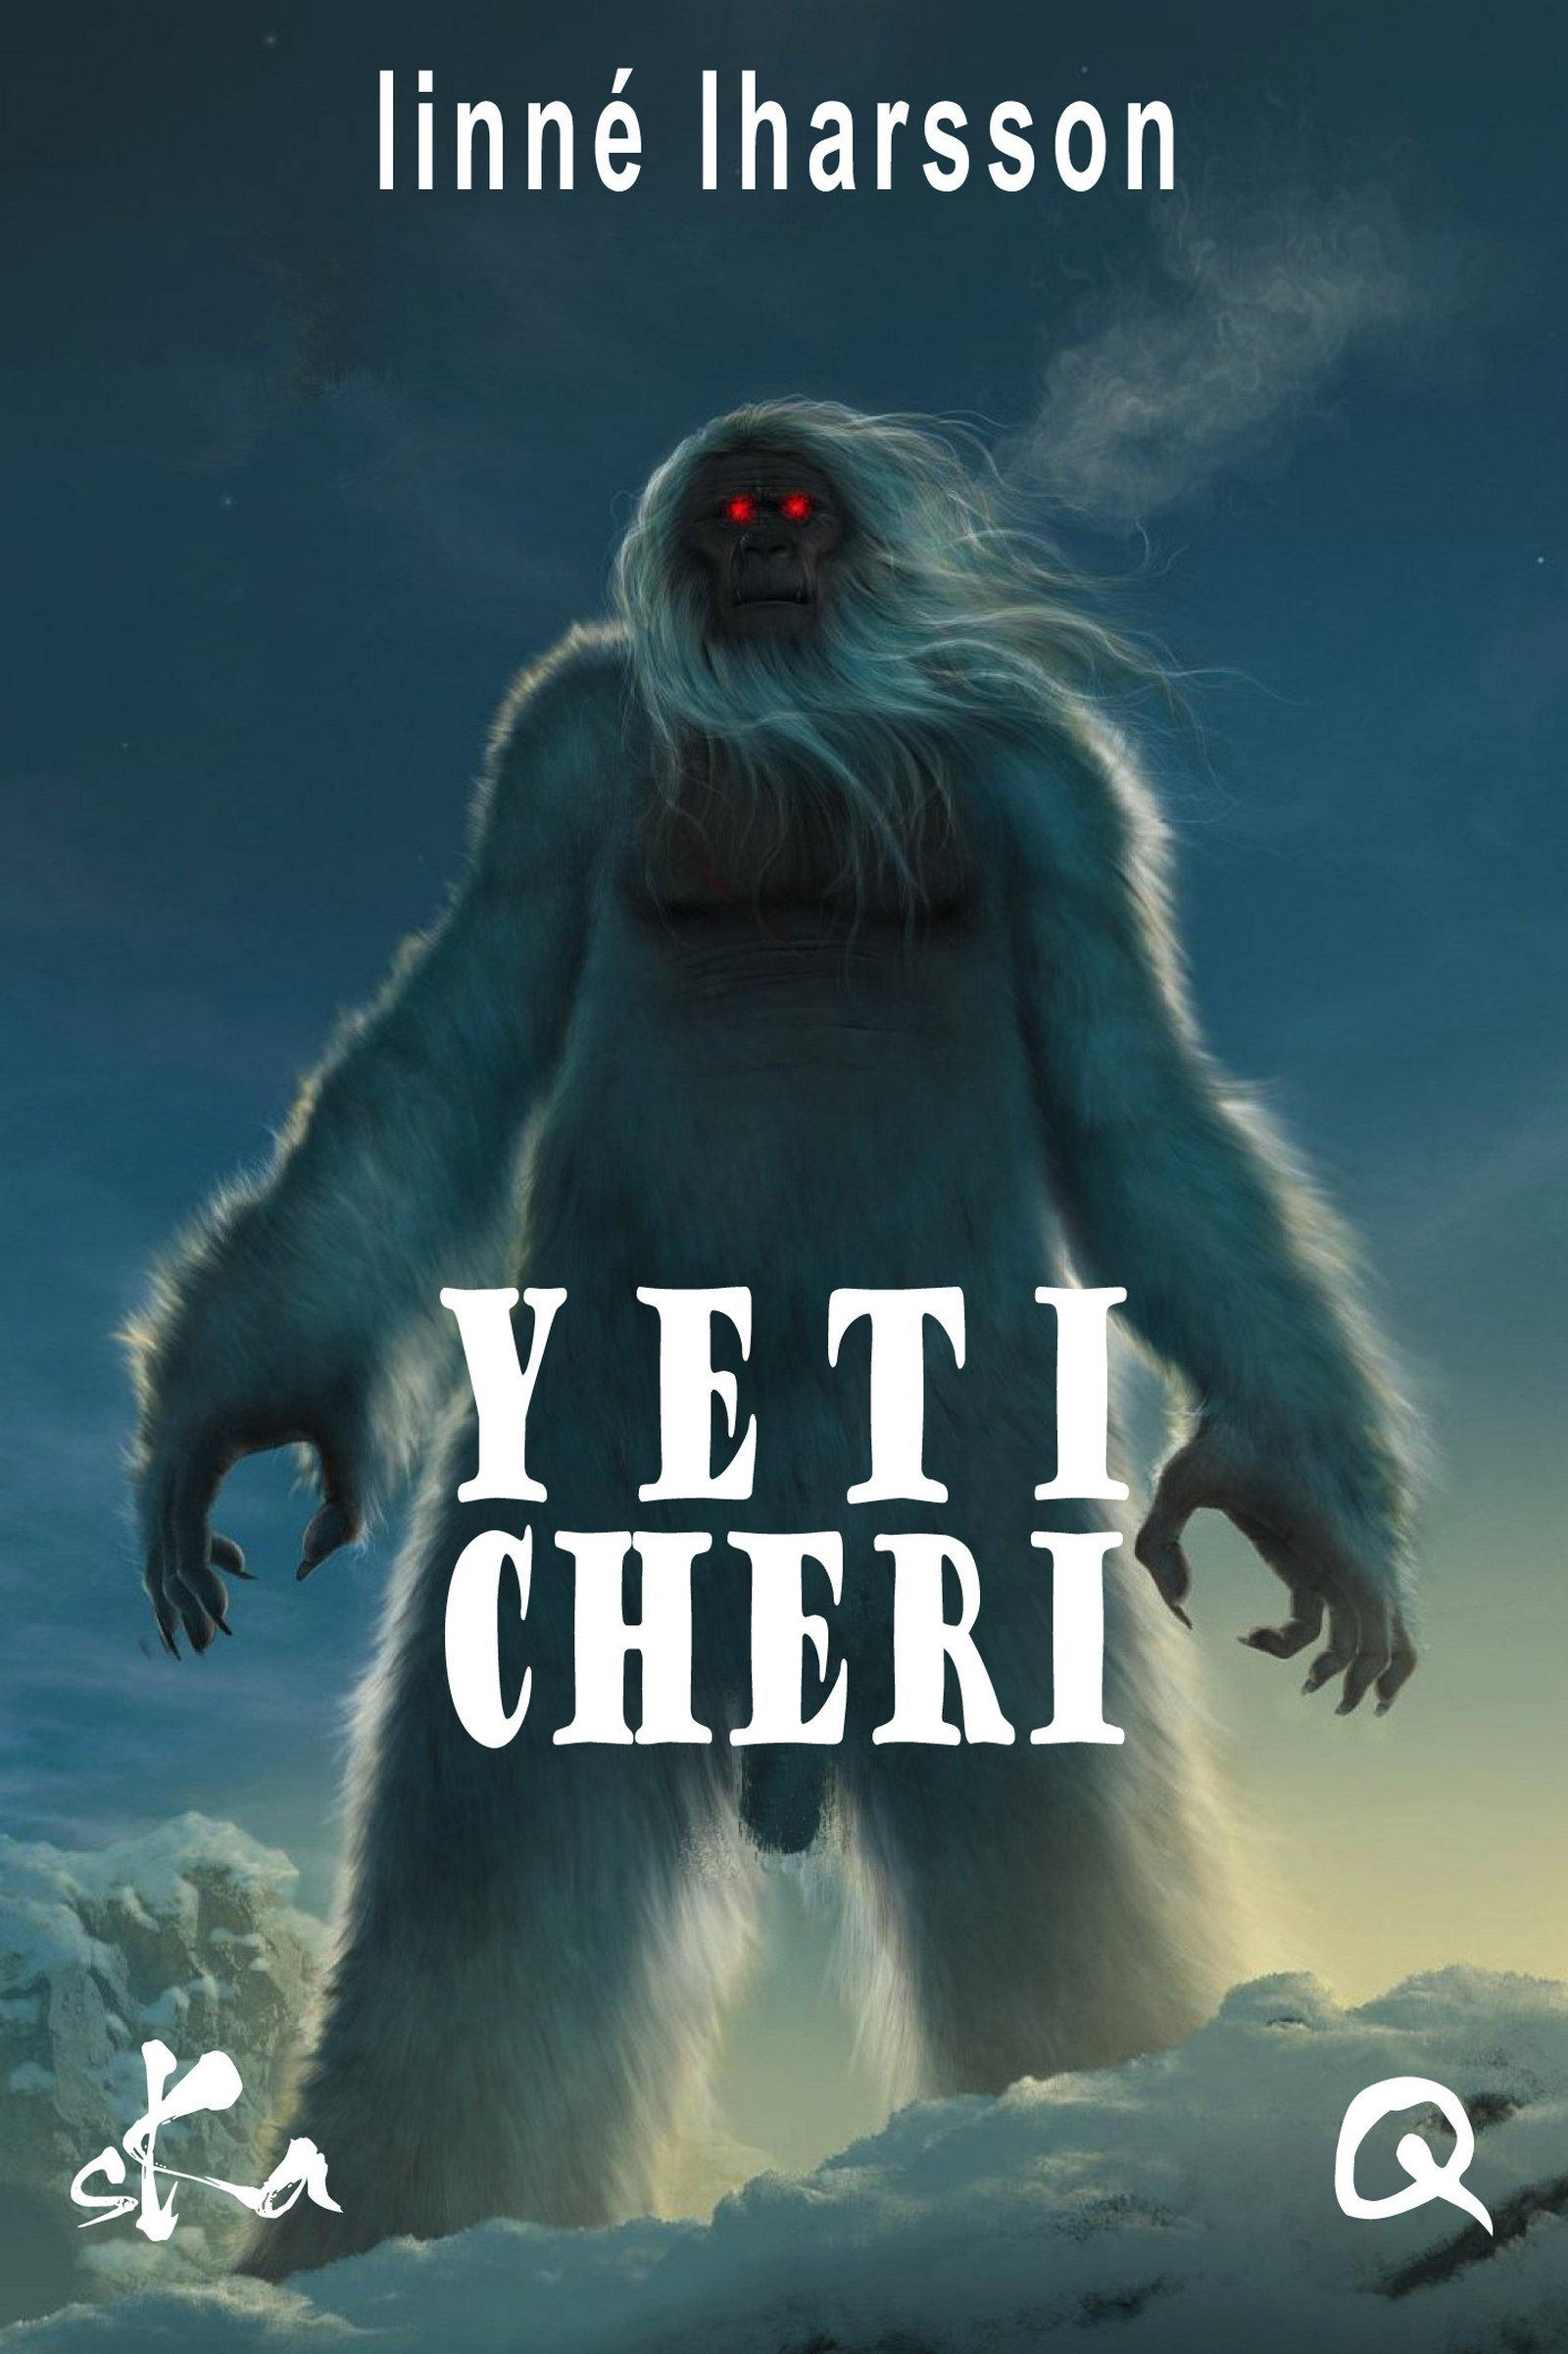 Yeti Chéri